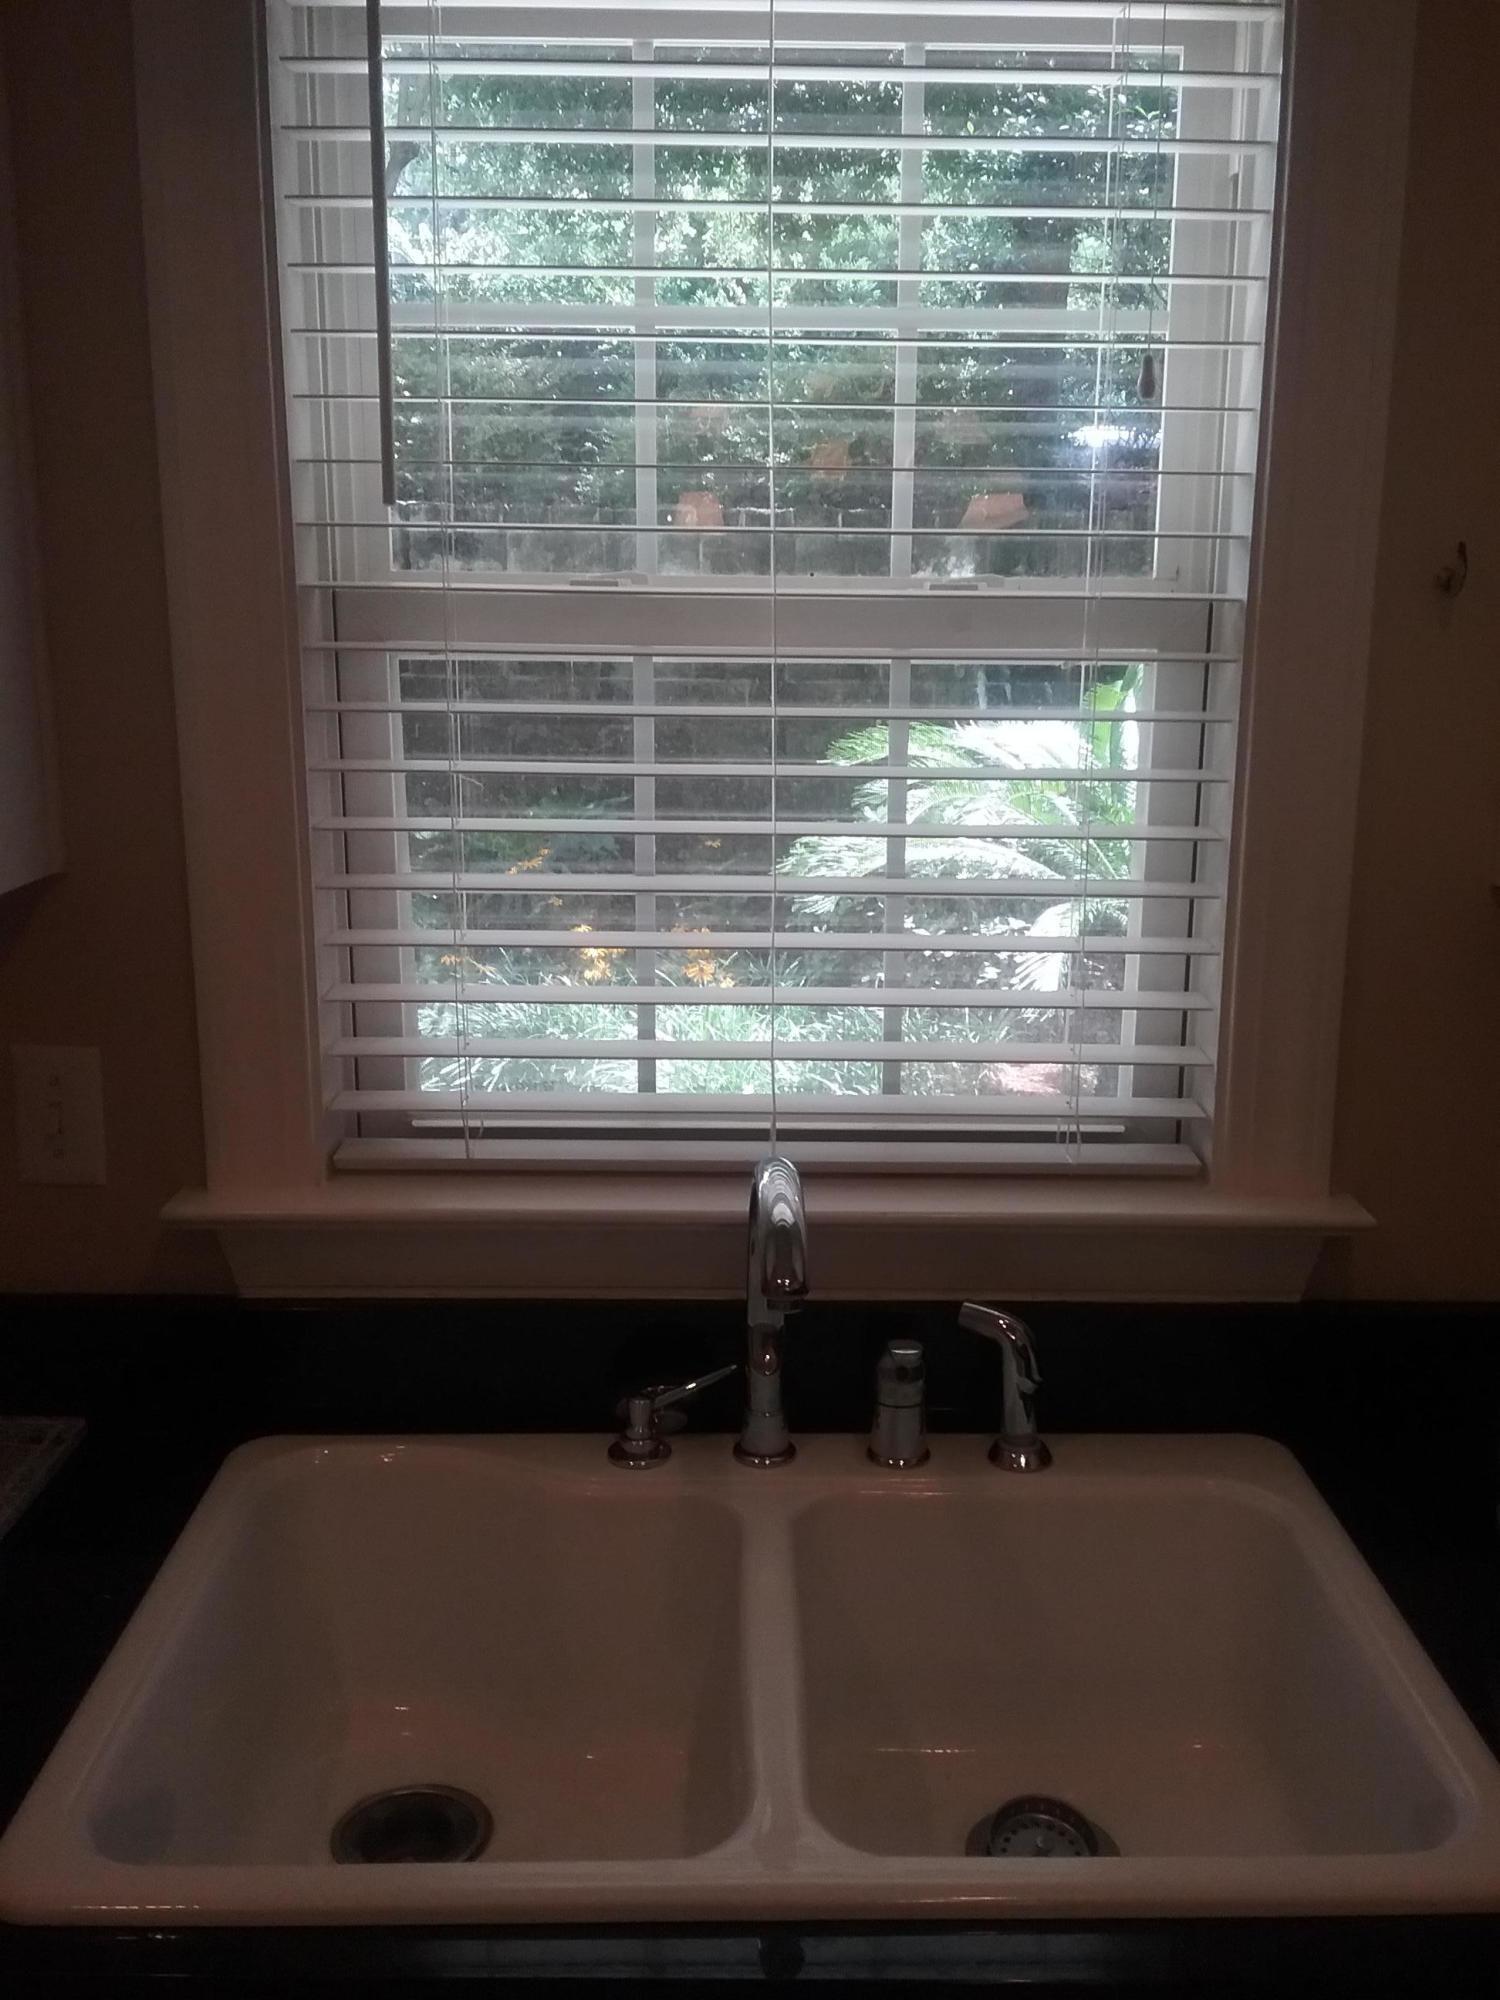 Ballards Pointe II Homes For Sale - 103 Ballard, Santee, SC - 5